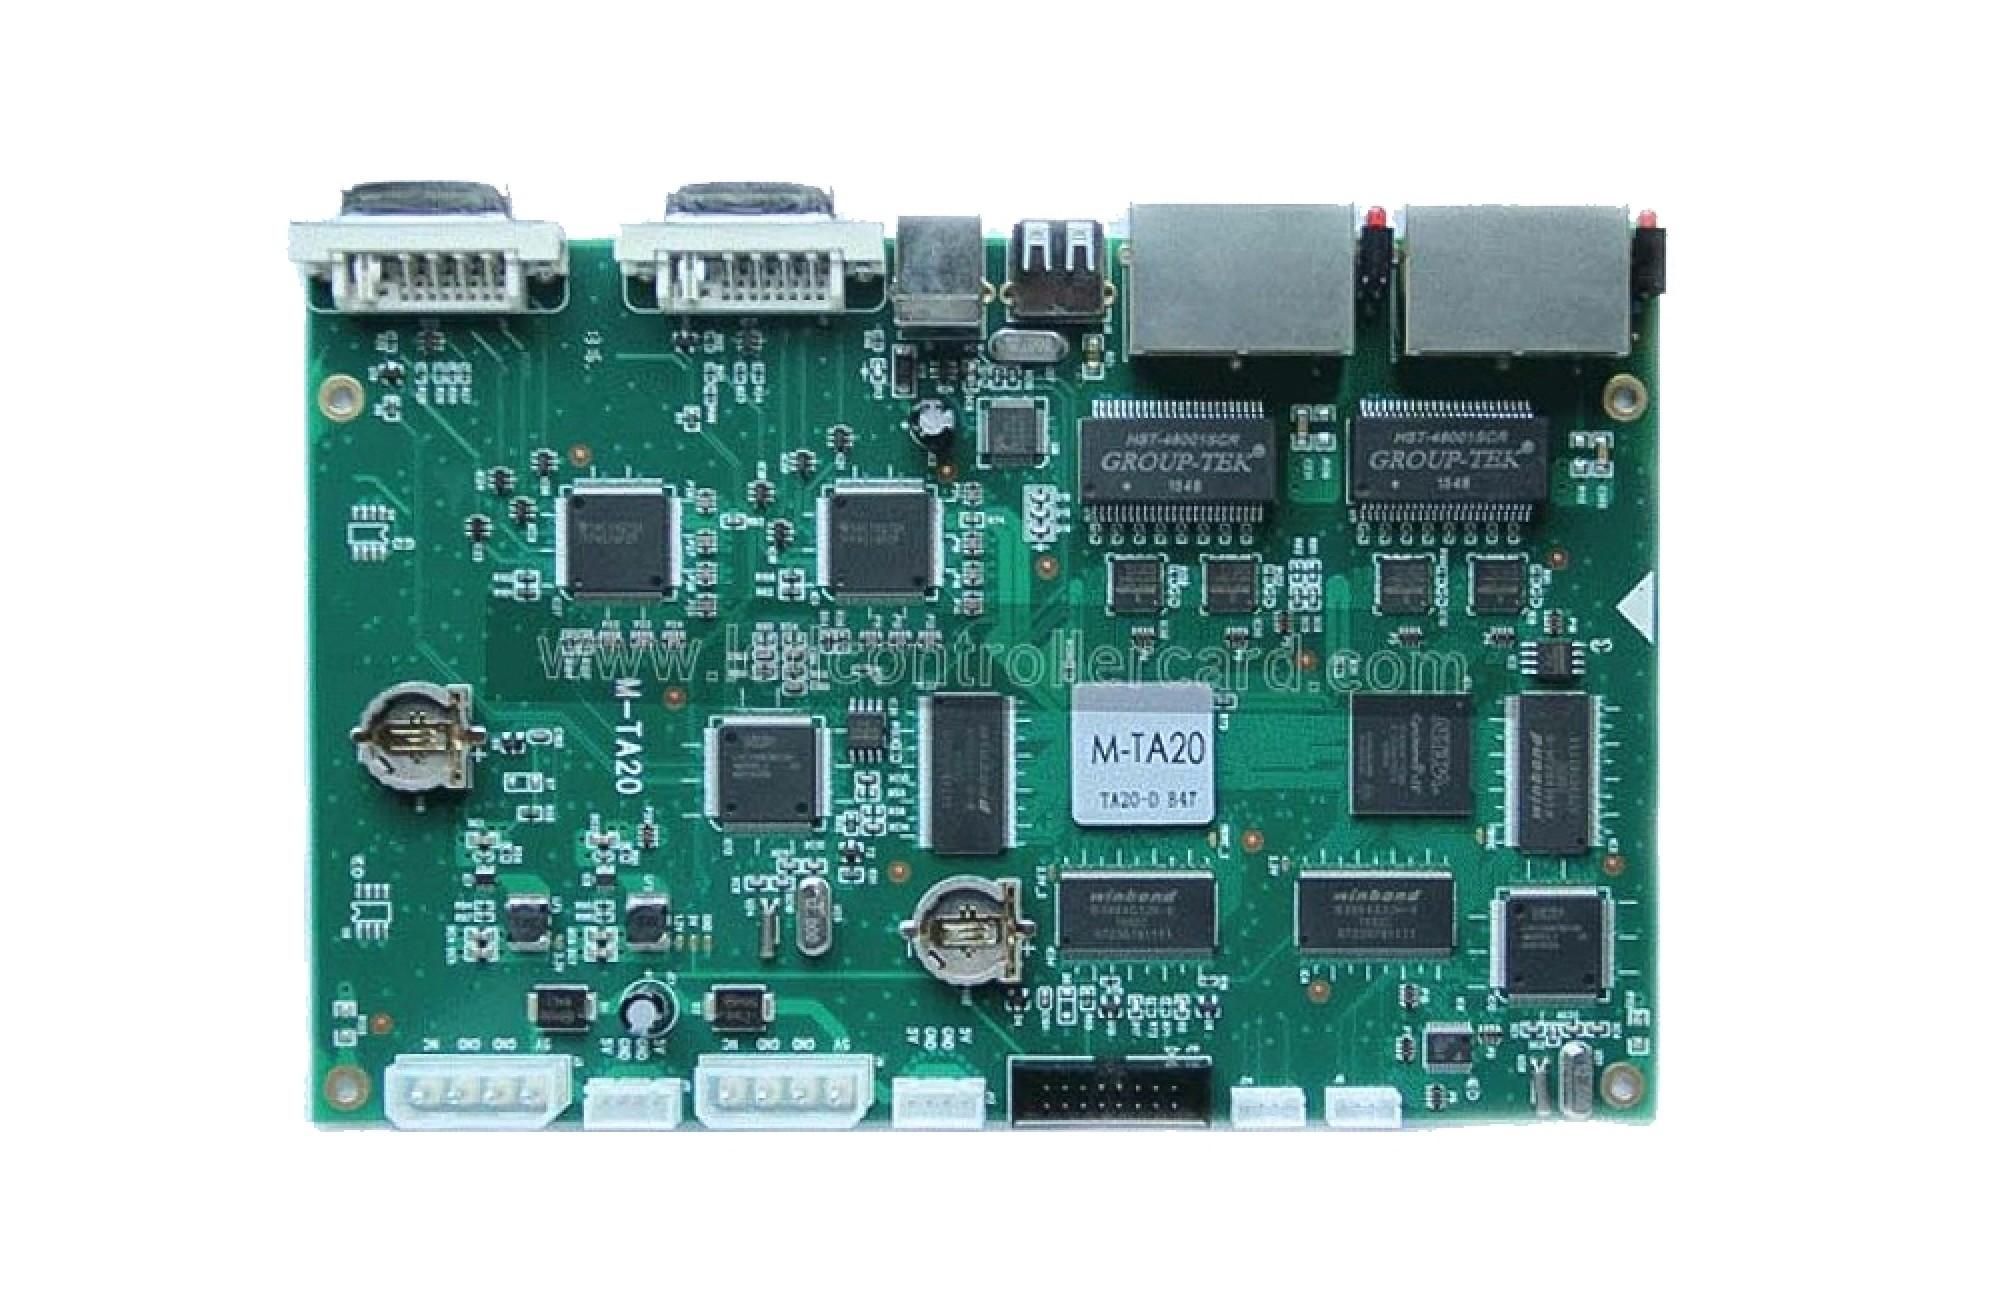 Mooncell M-TA20 Large LED Display Sender Card